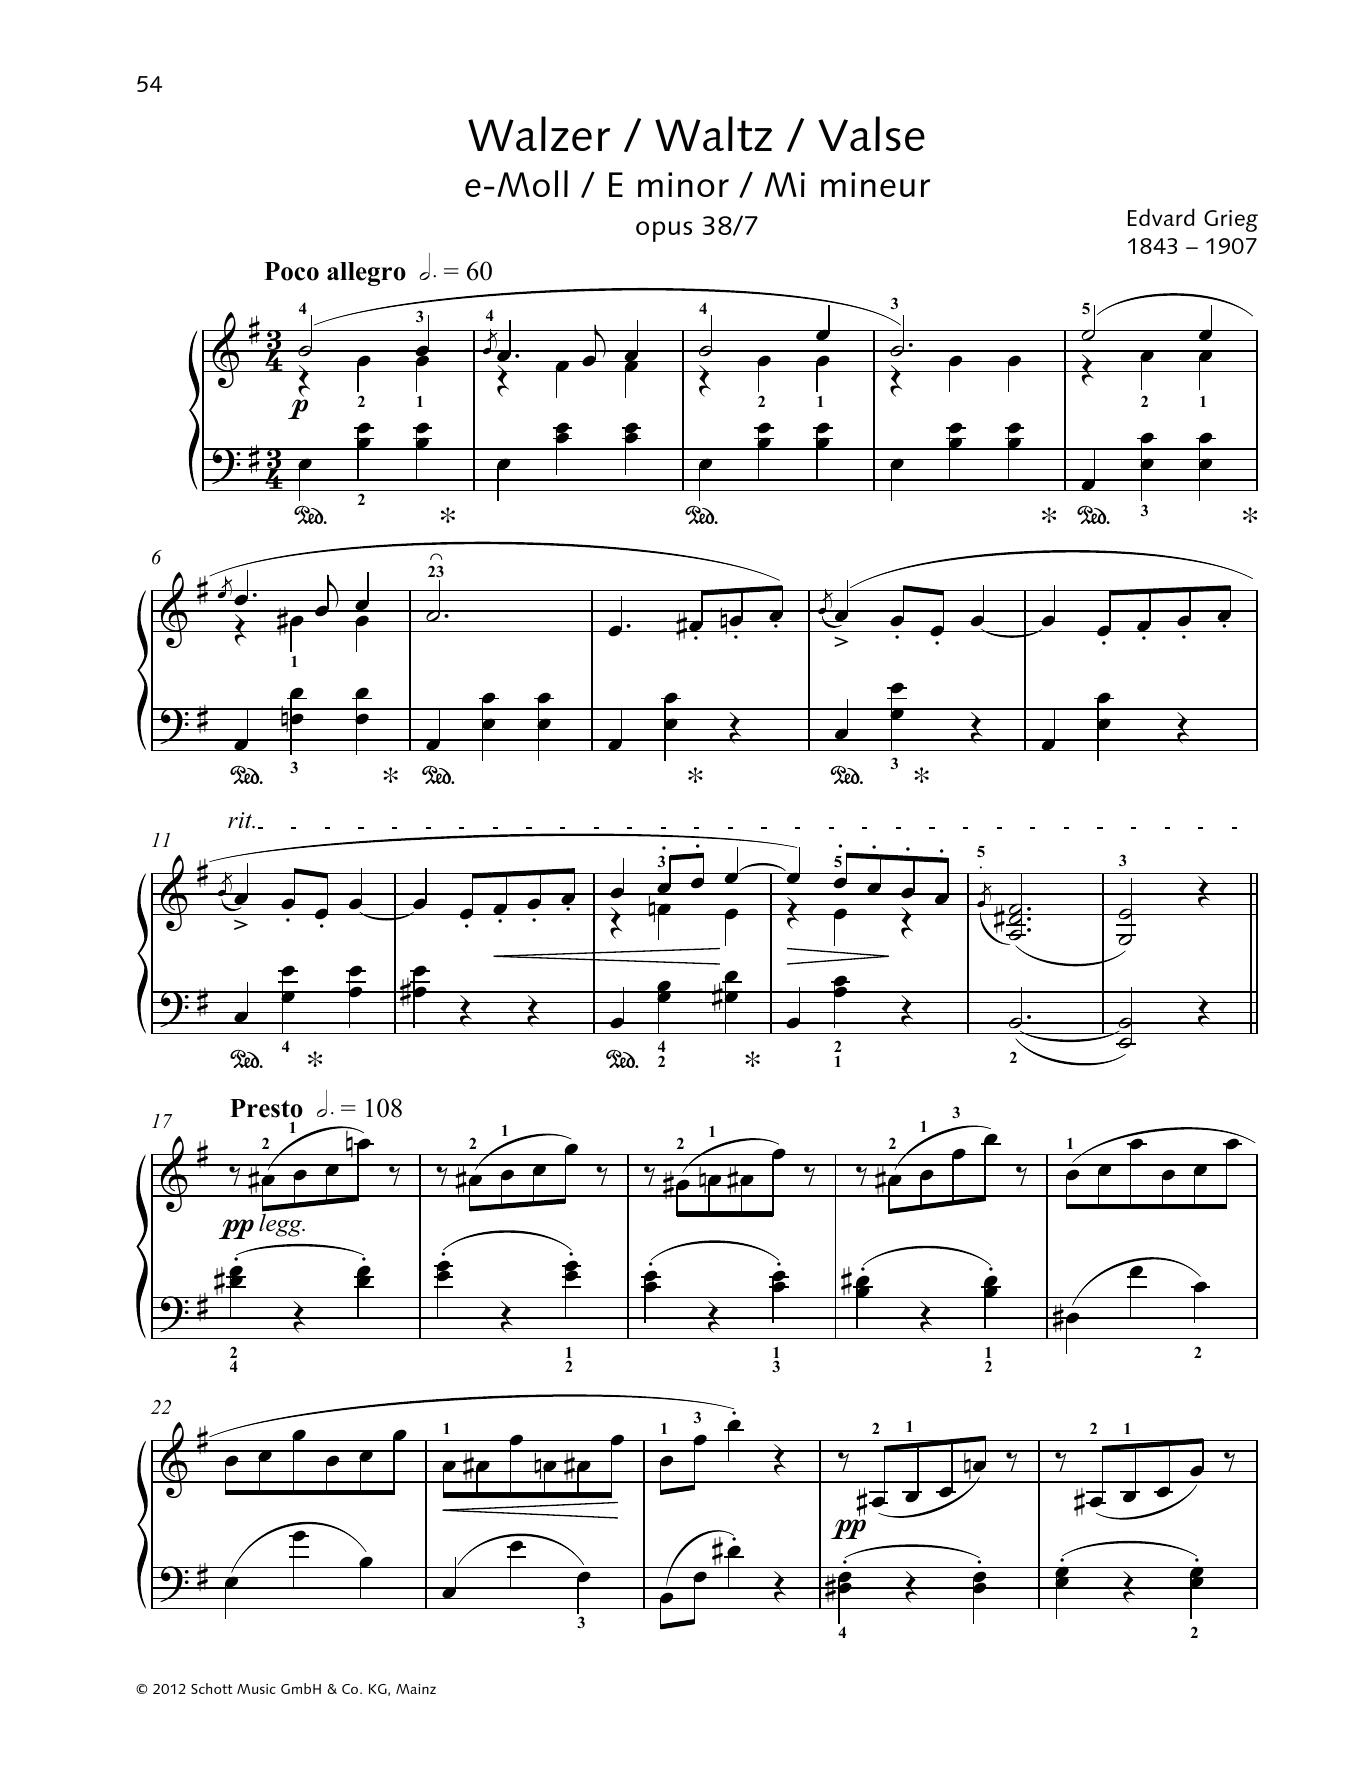 Waltz E minor Sheet Music